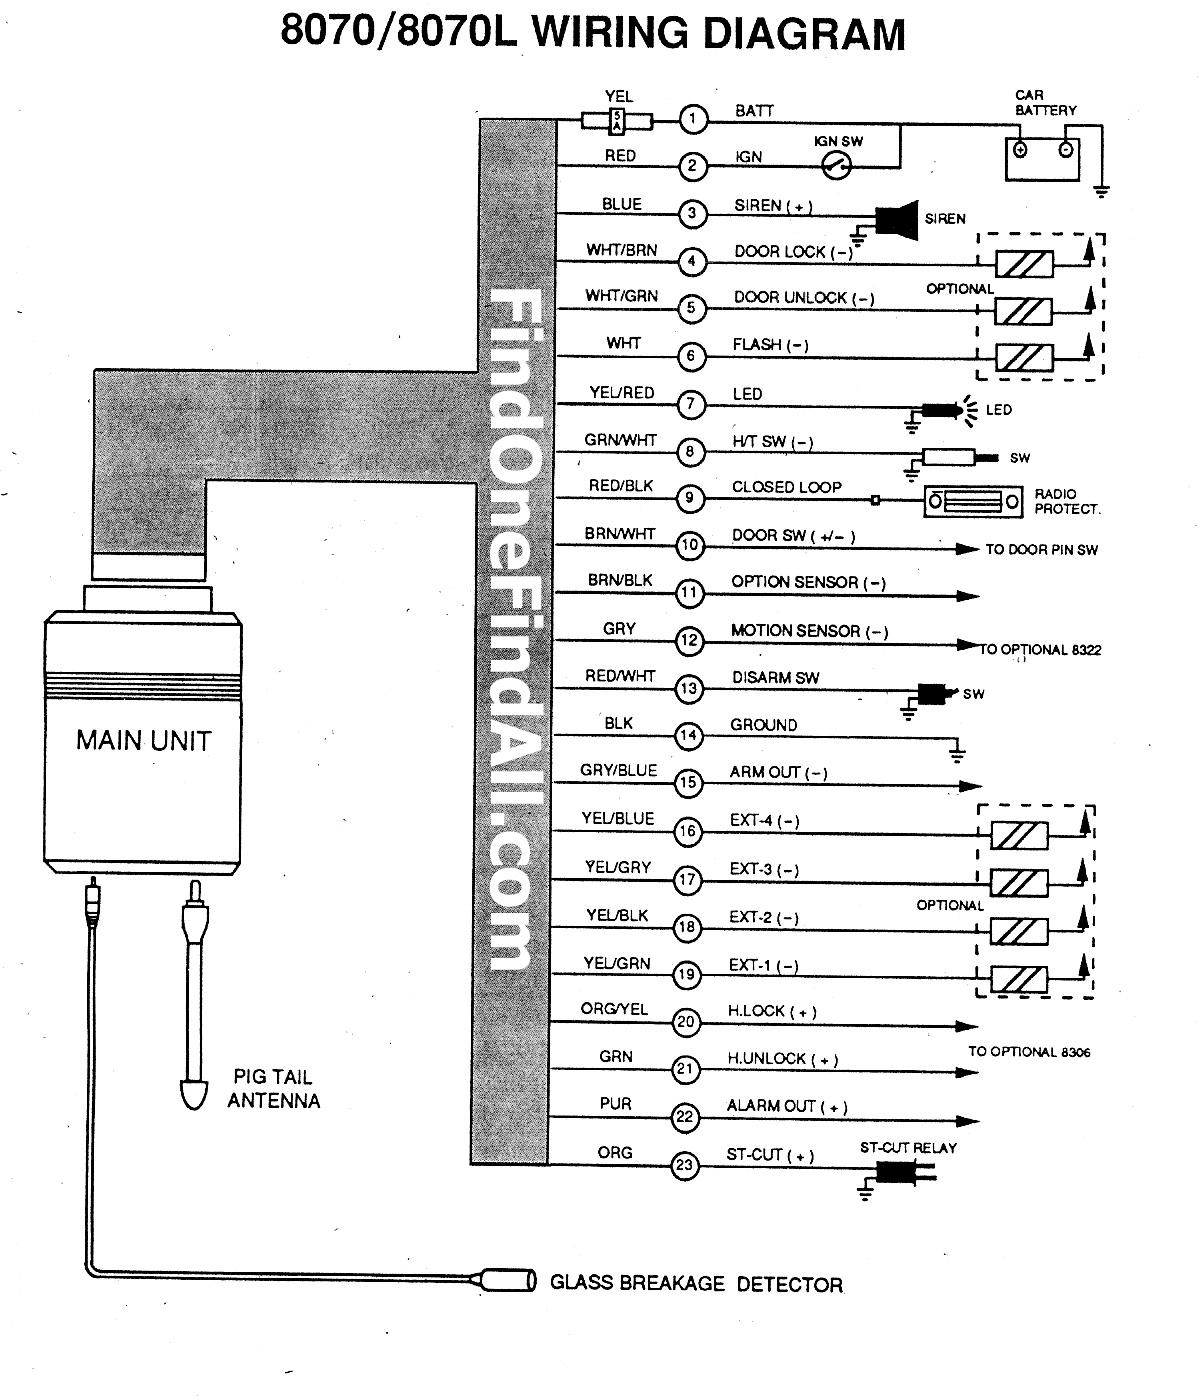 [DIAGRAM_3US]  GH_9409] Alpine Cda Wire Harness Diagram Further Alpine Stereo Wiring  Diagram Free Diagram | Alpine 7163 Wiring Harness |  | Tomy Shopa Mohammedshrine Librar Wiring 101